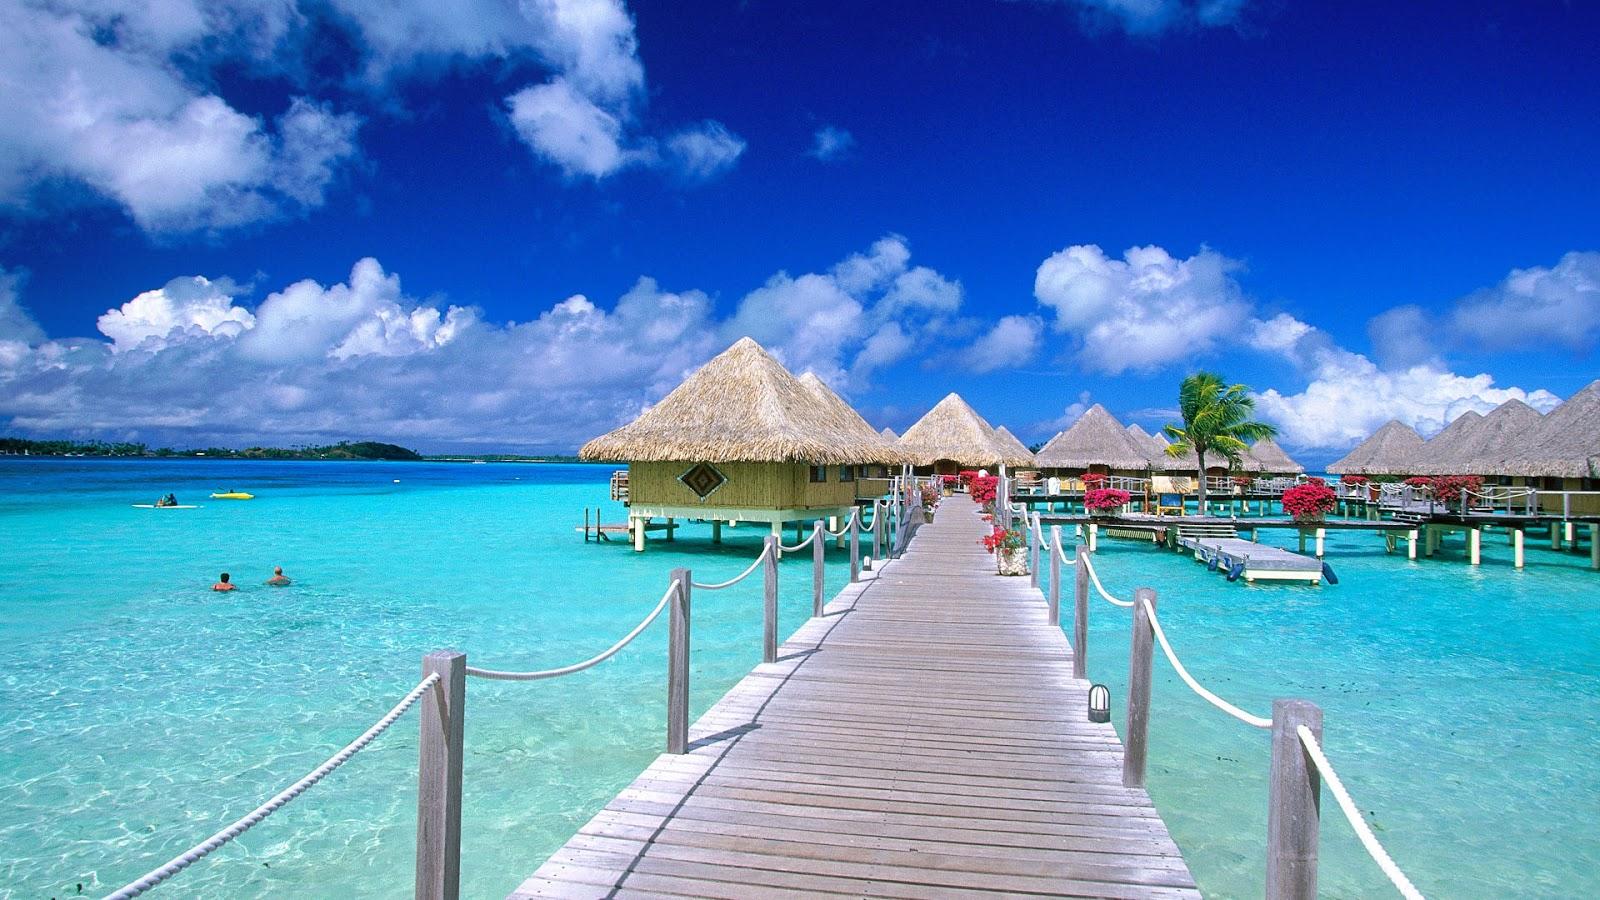 Free Desktop Backgrounds Beaches